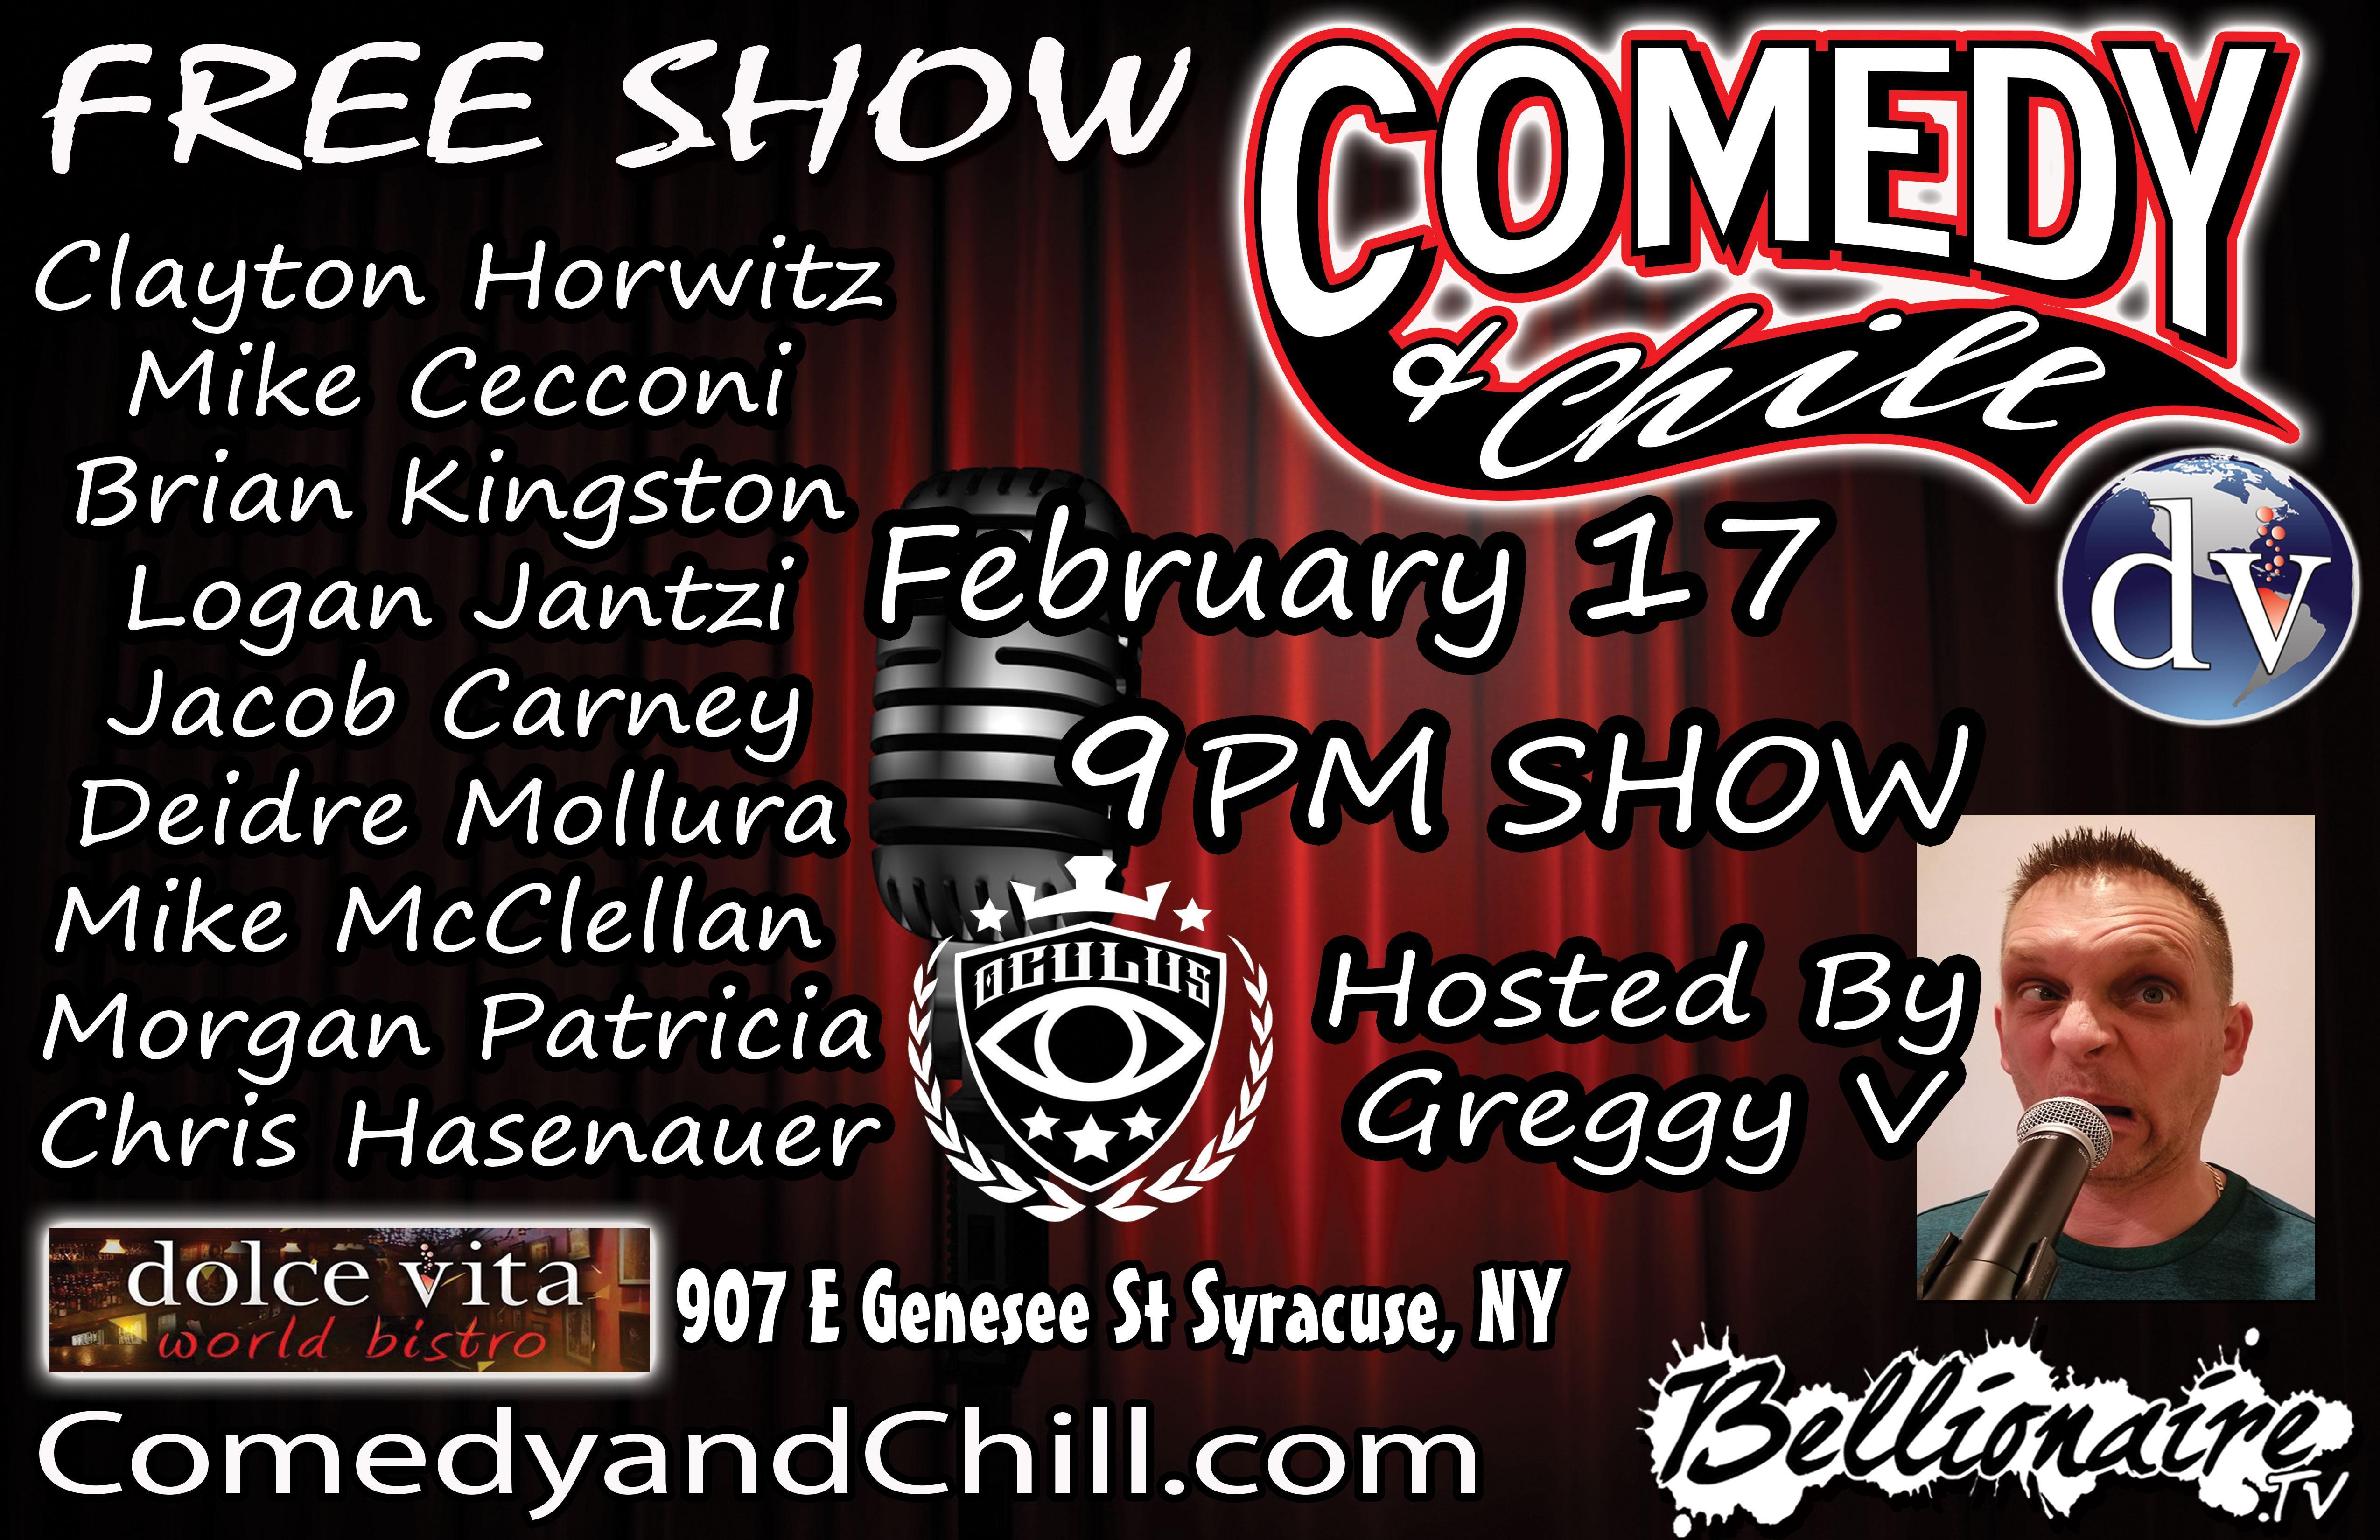 Comedy & Chill February Show #Bellionaire